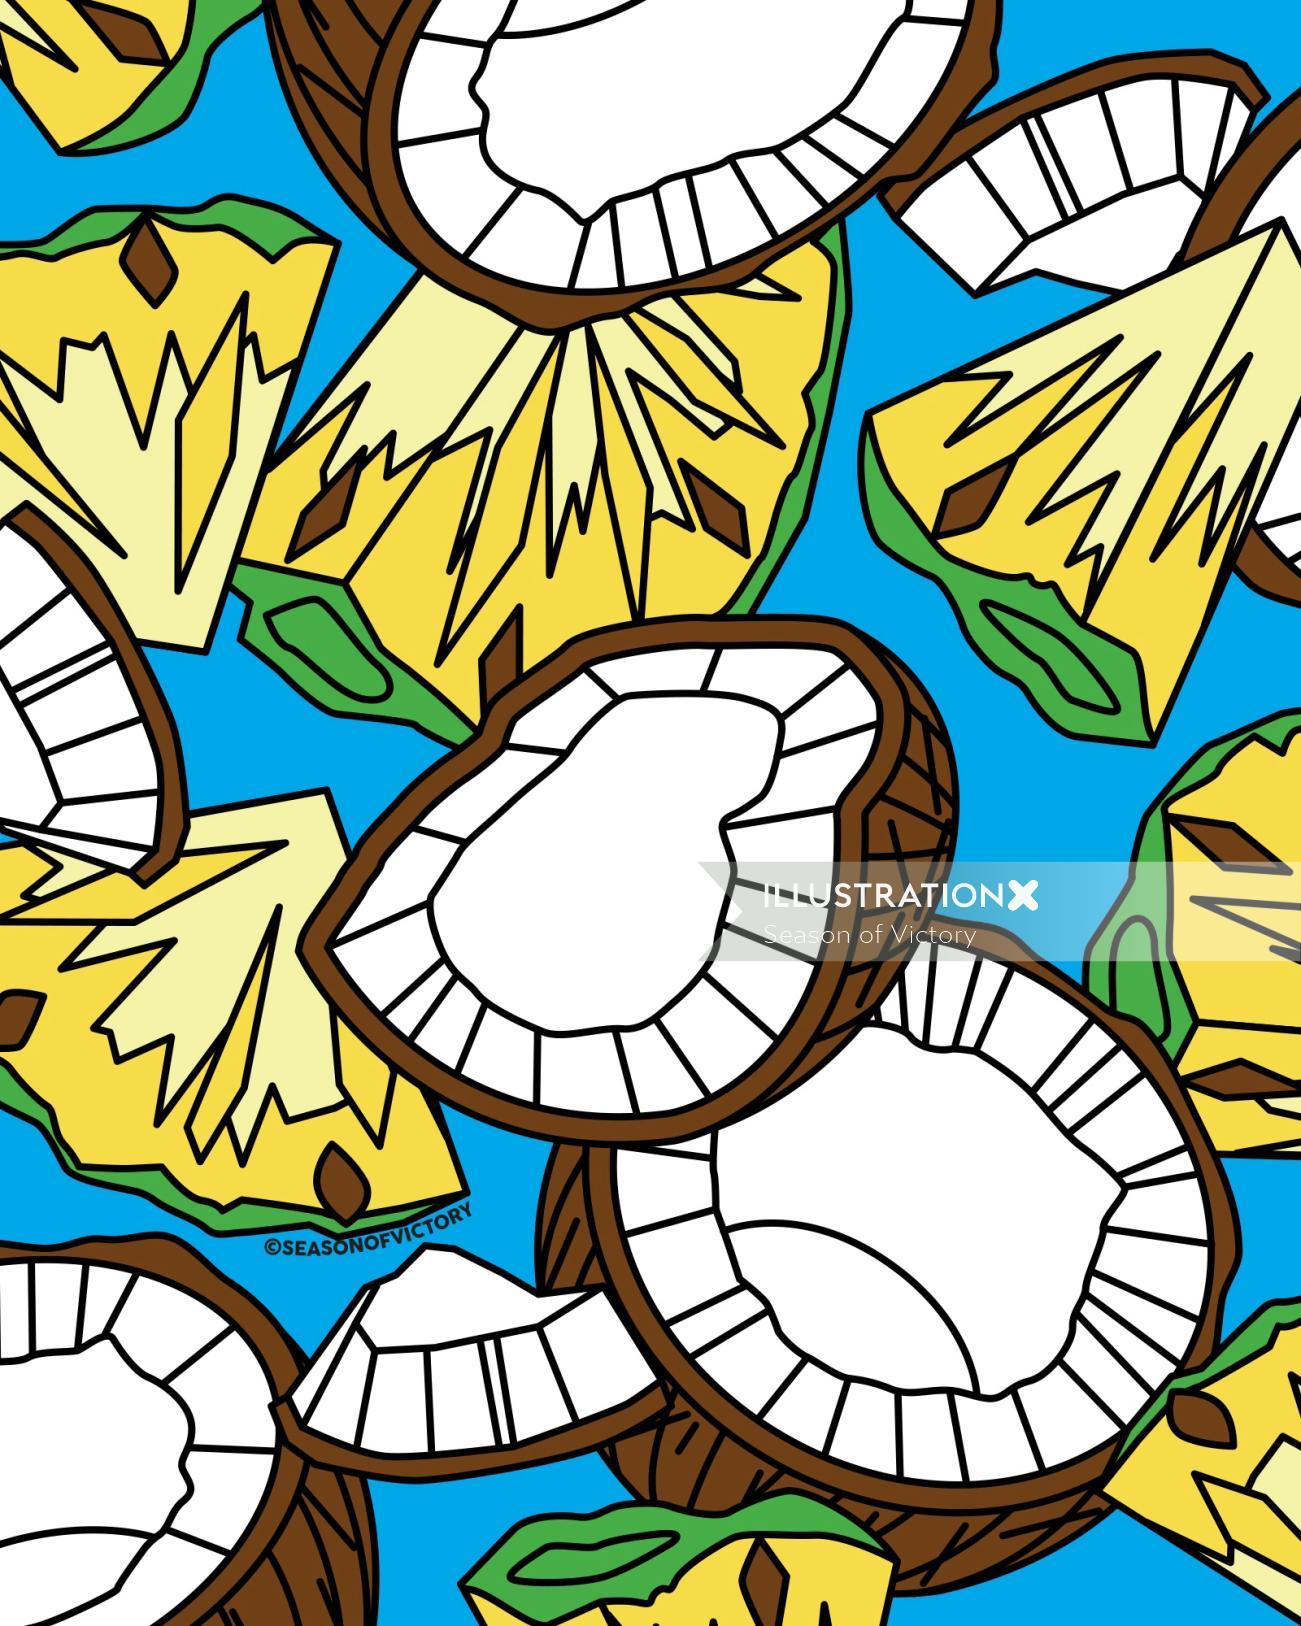 Coconut illustration for packaging design flavored drinks